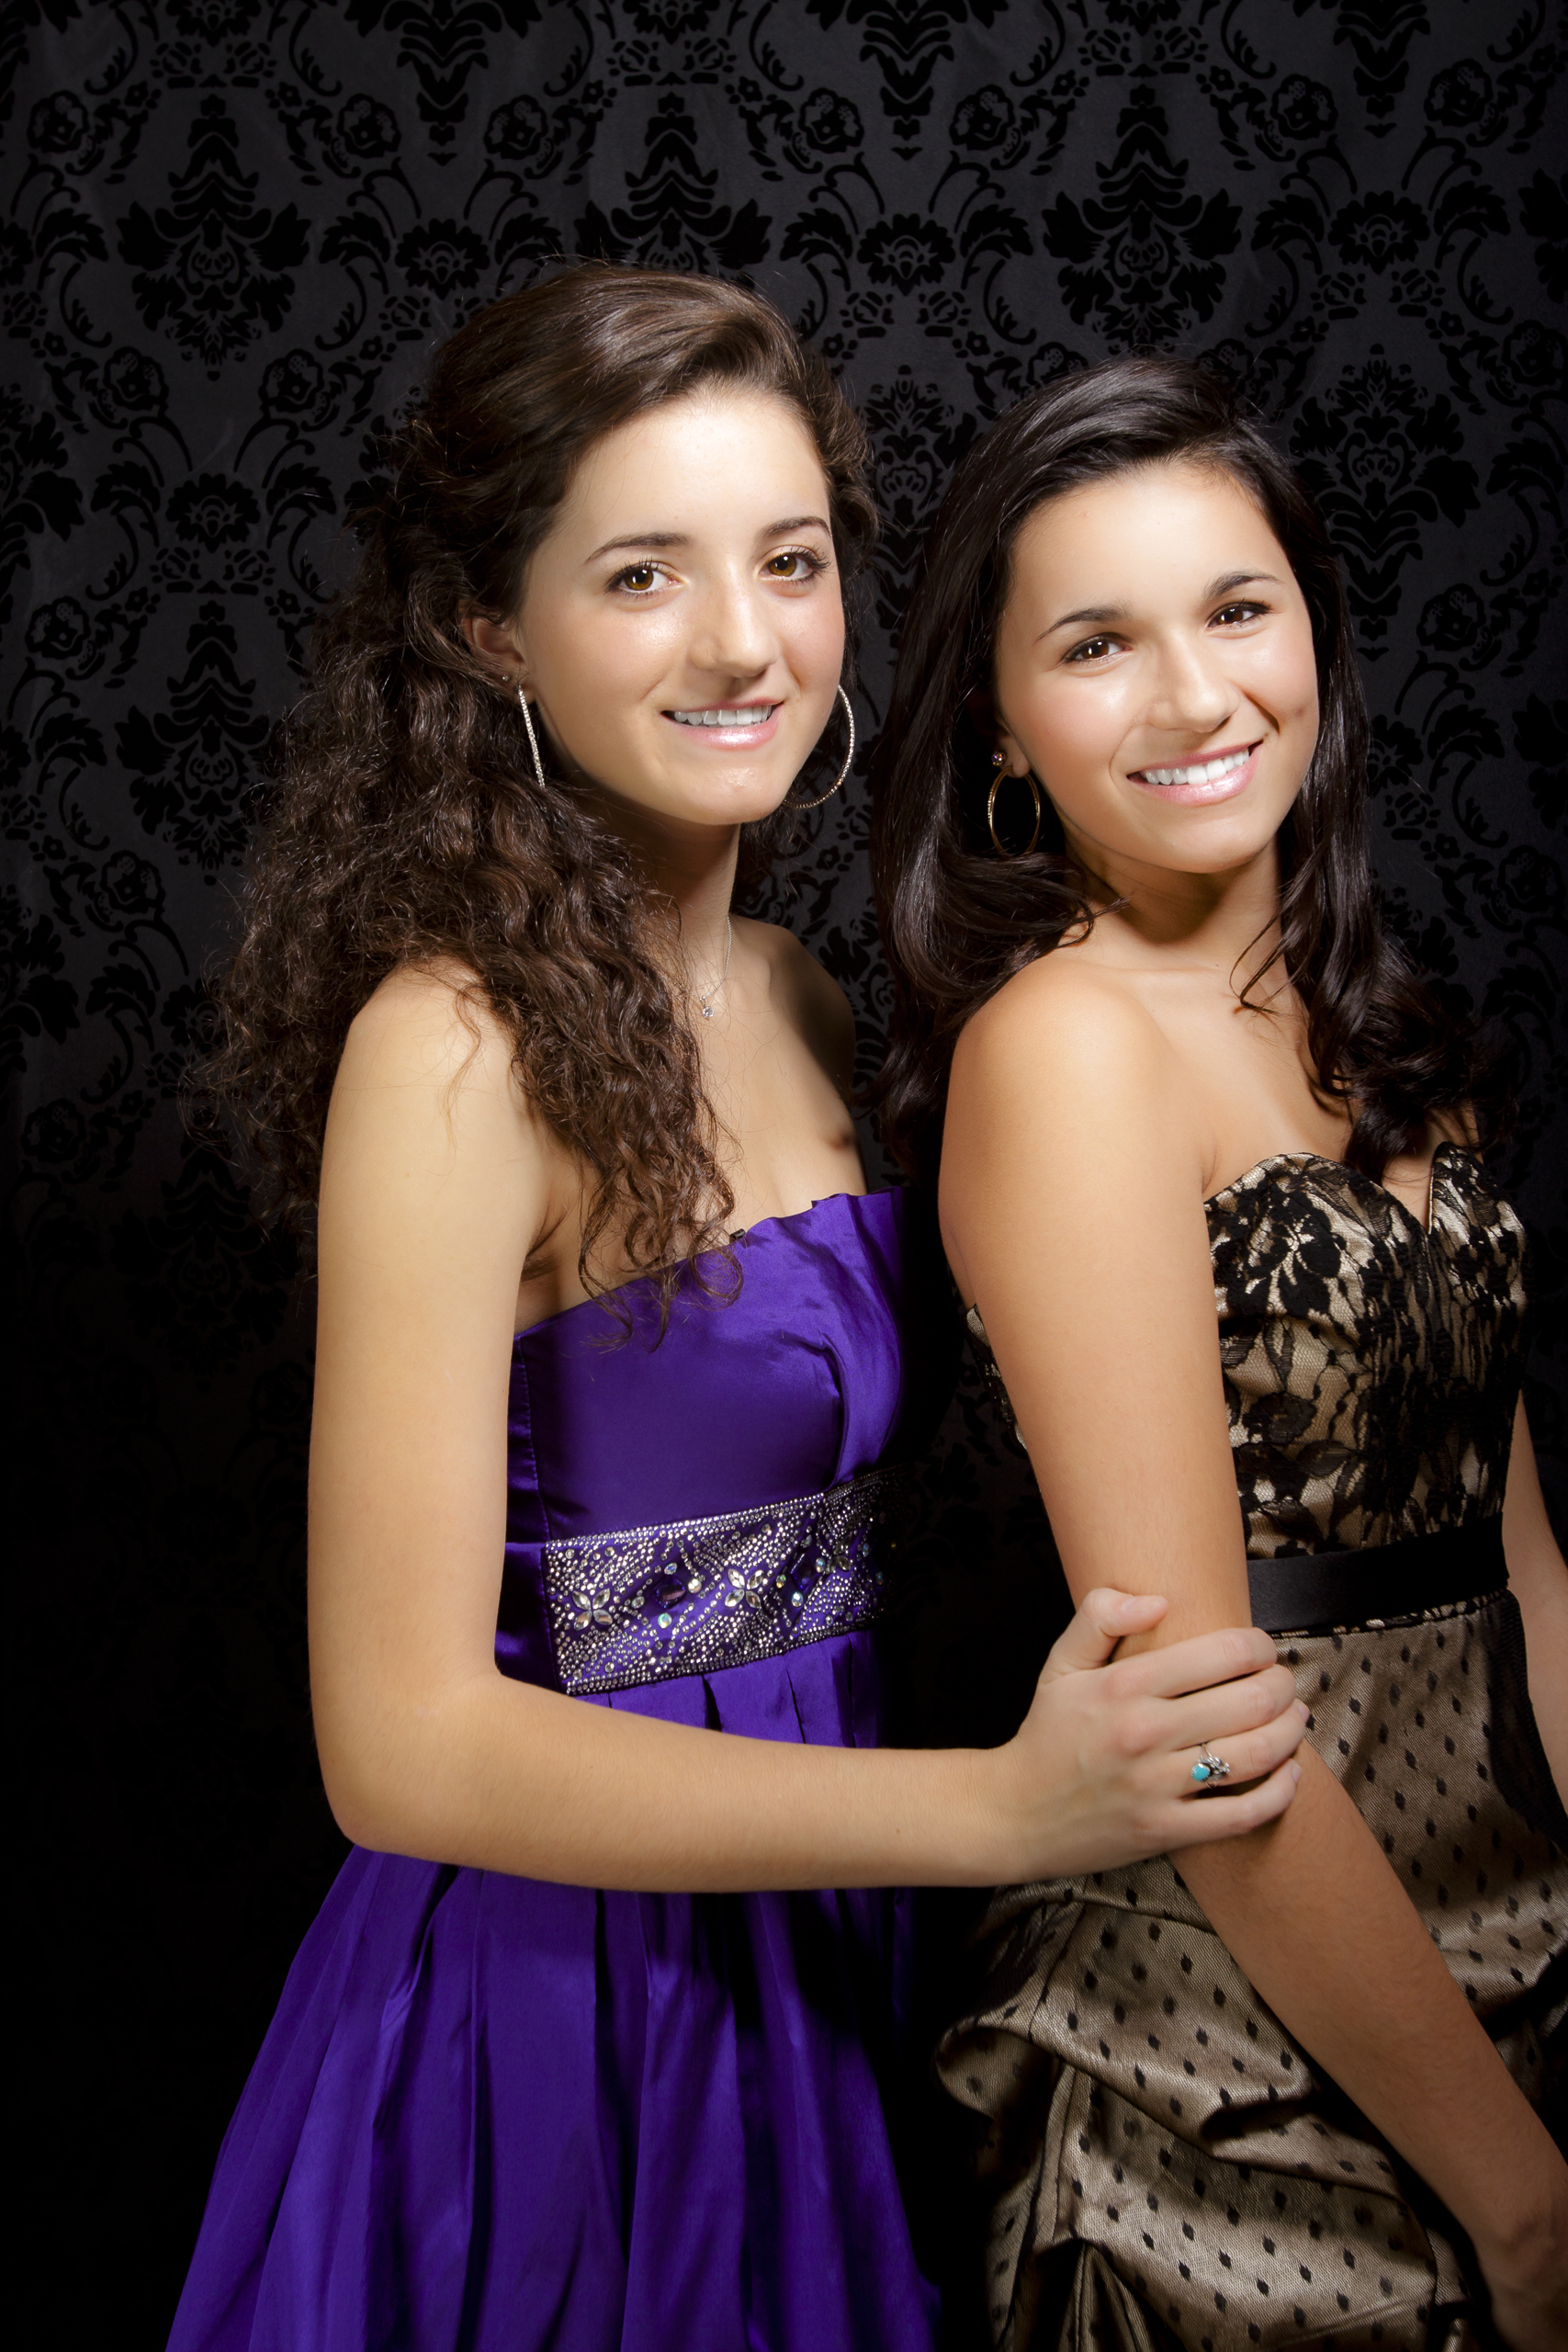 modern styled family portrait session prom dress sisters on black background 3.jpg